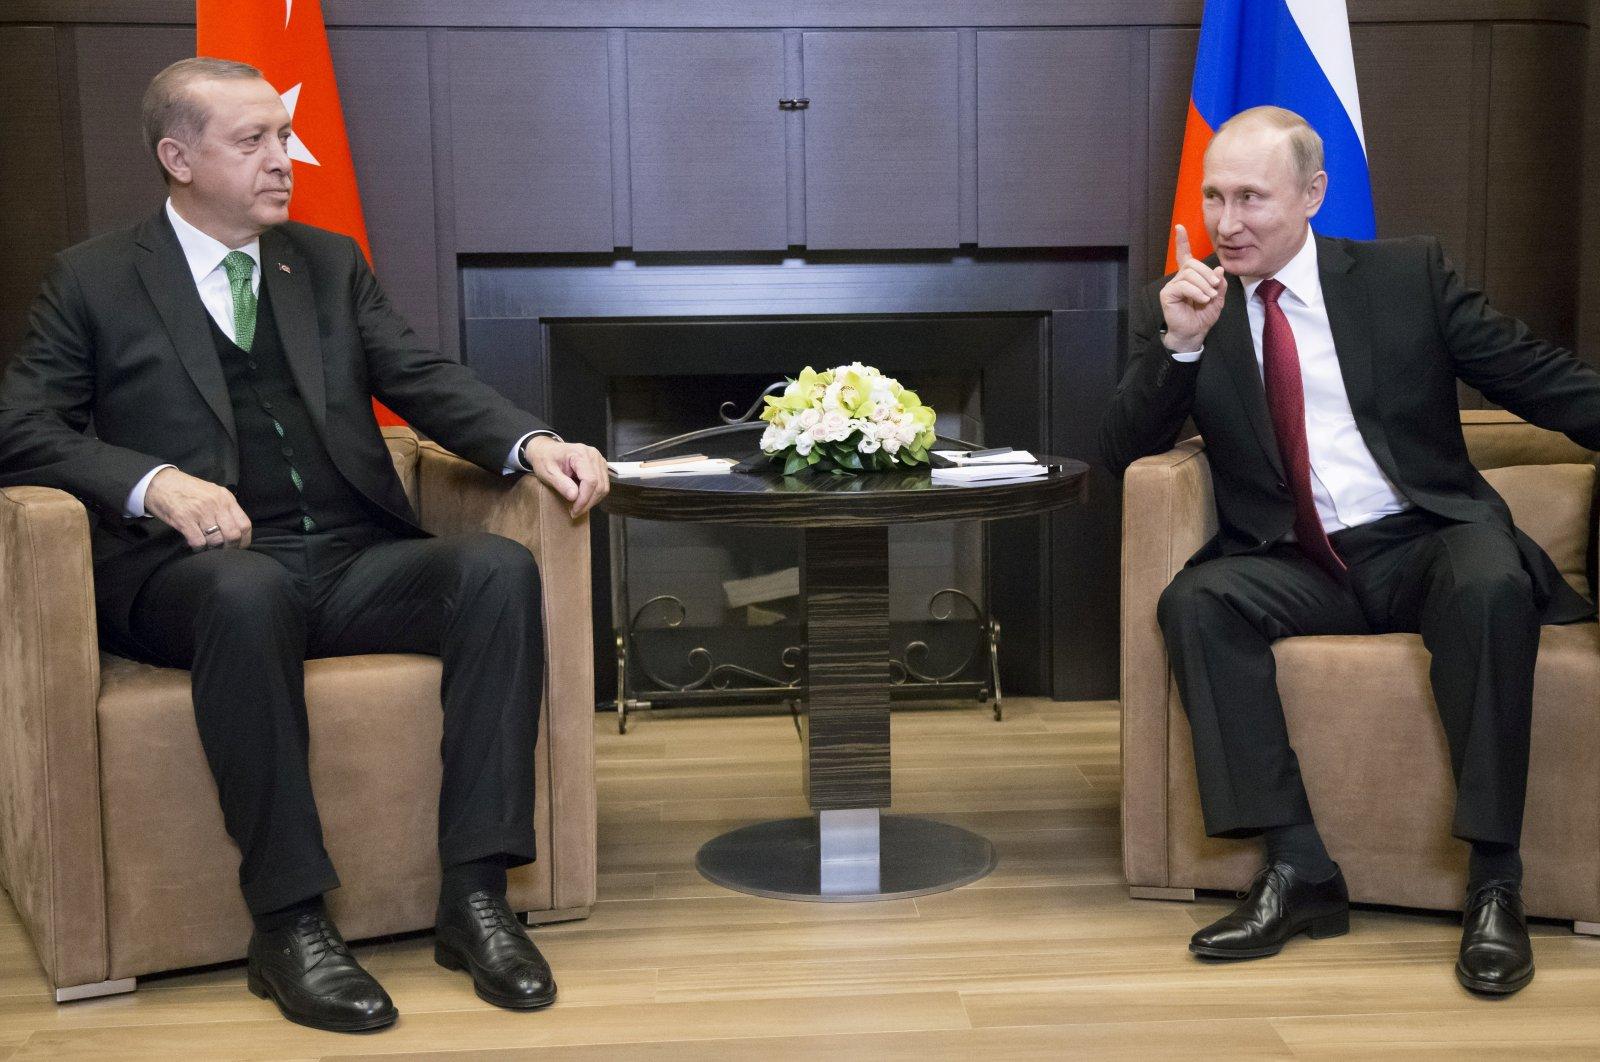 Erdoğan, Putin expected to meet in Sochi to discuss Syria